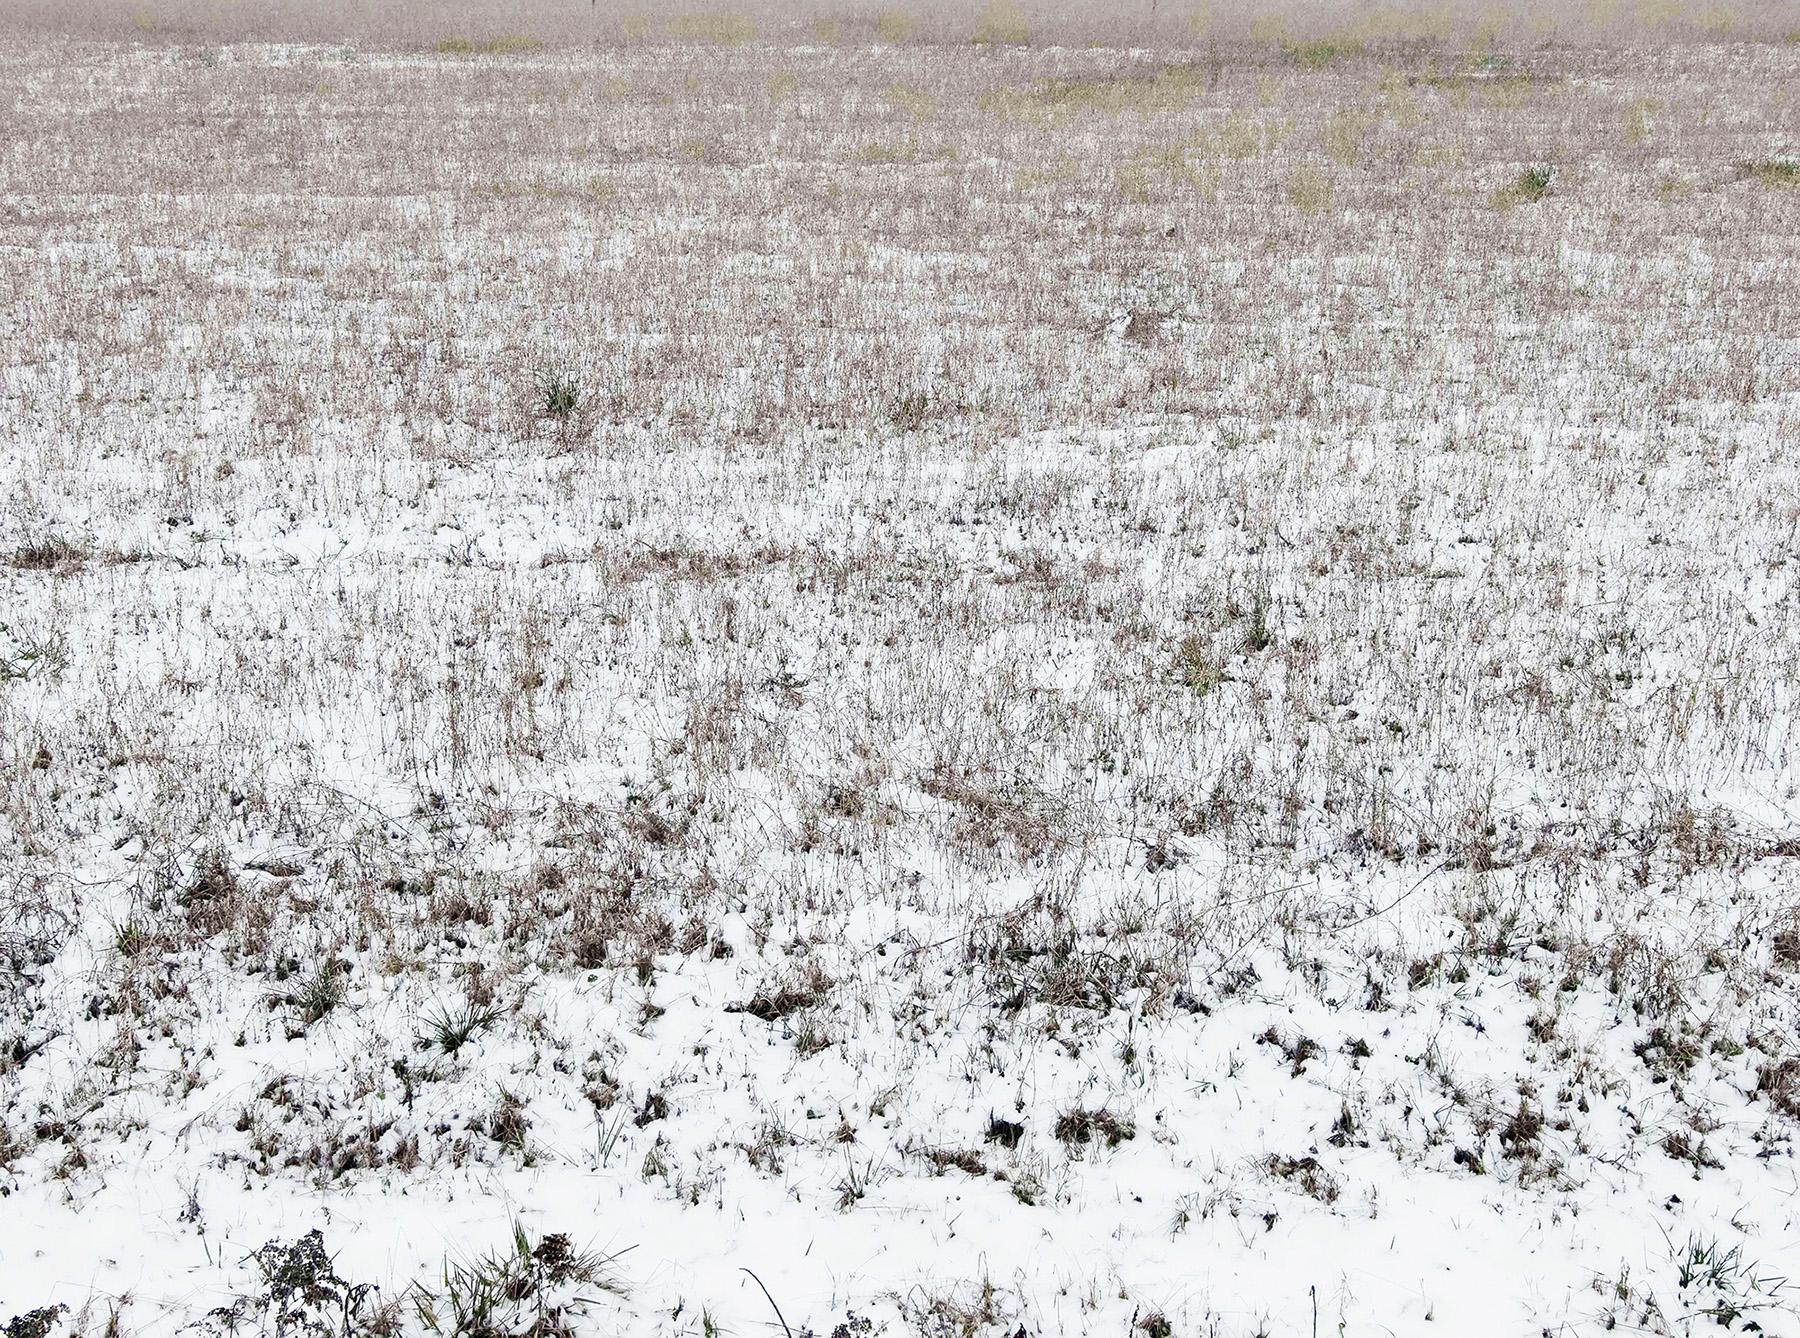 AR_SNOW--101.jpg